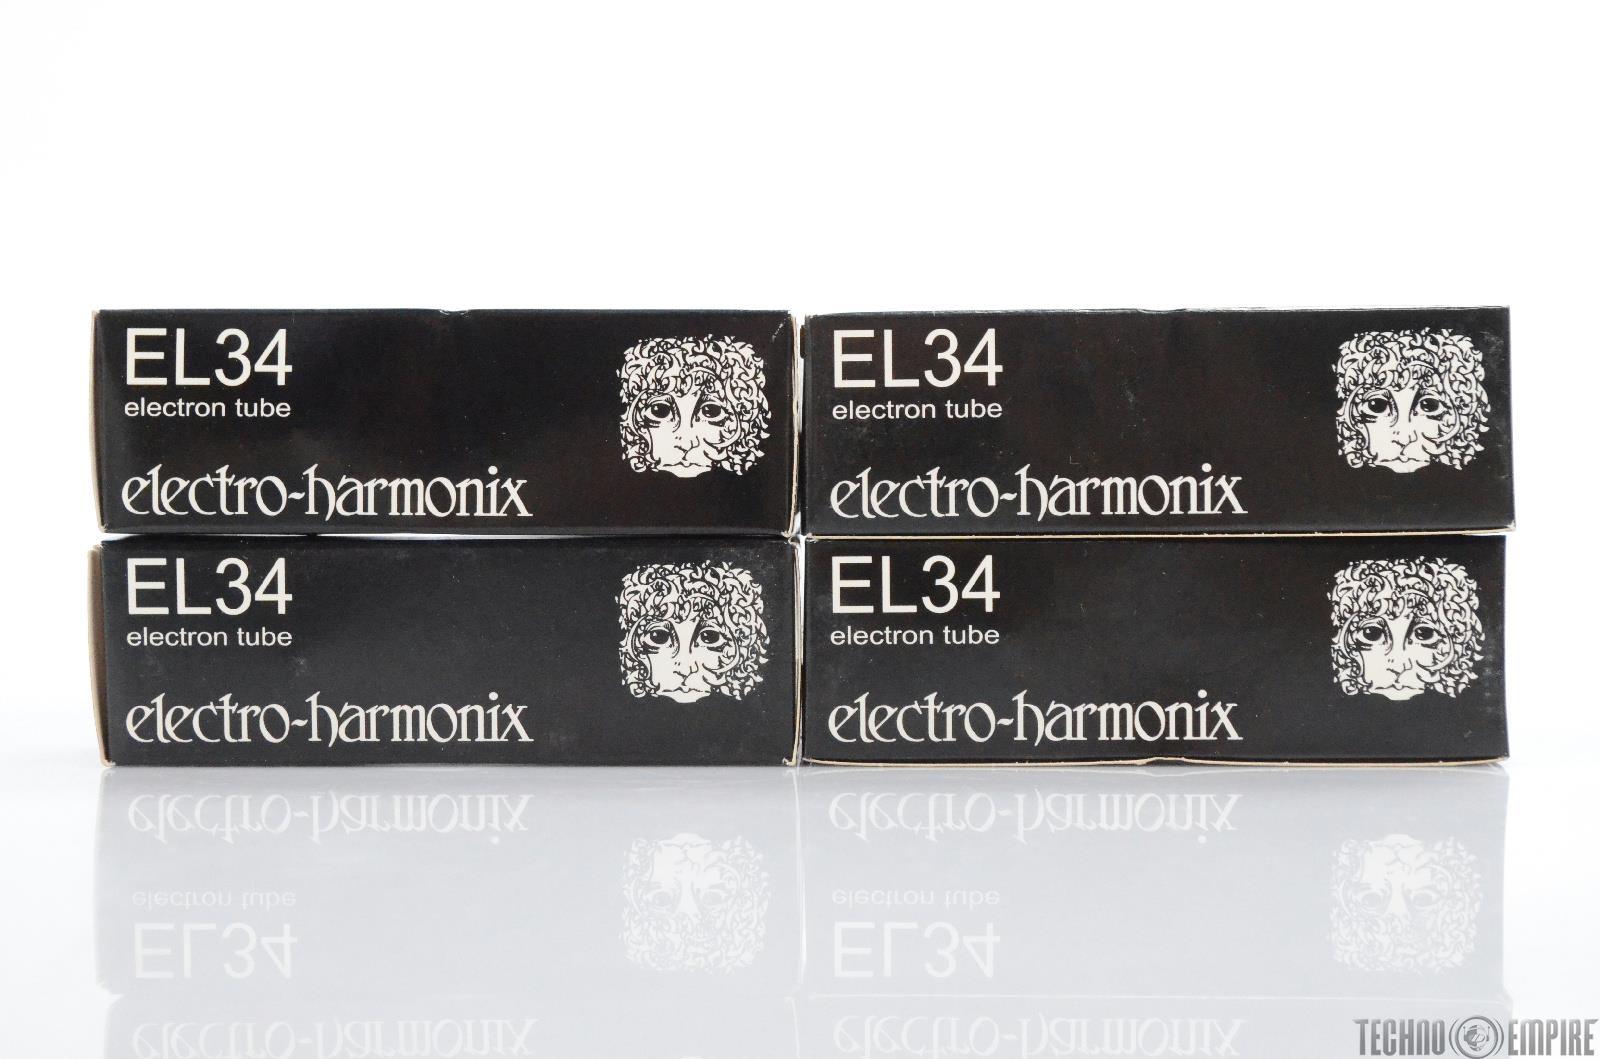 4 Electro-Harmonix EL34 Electron Vacuum Tubes (Matched) #30307